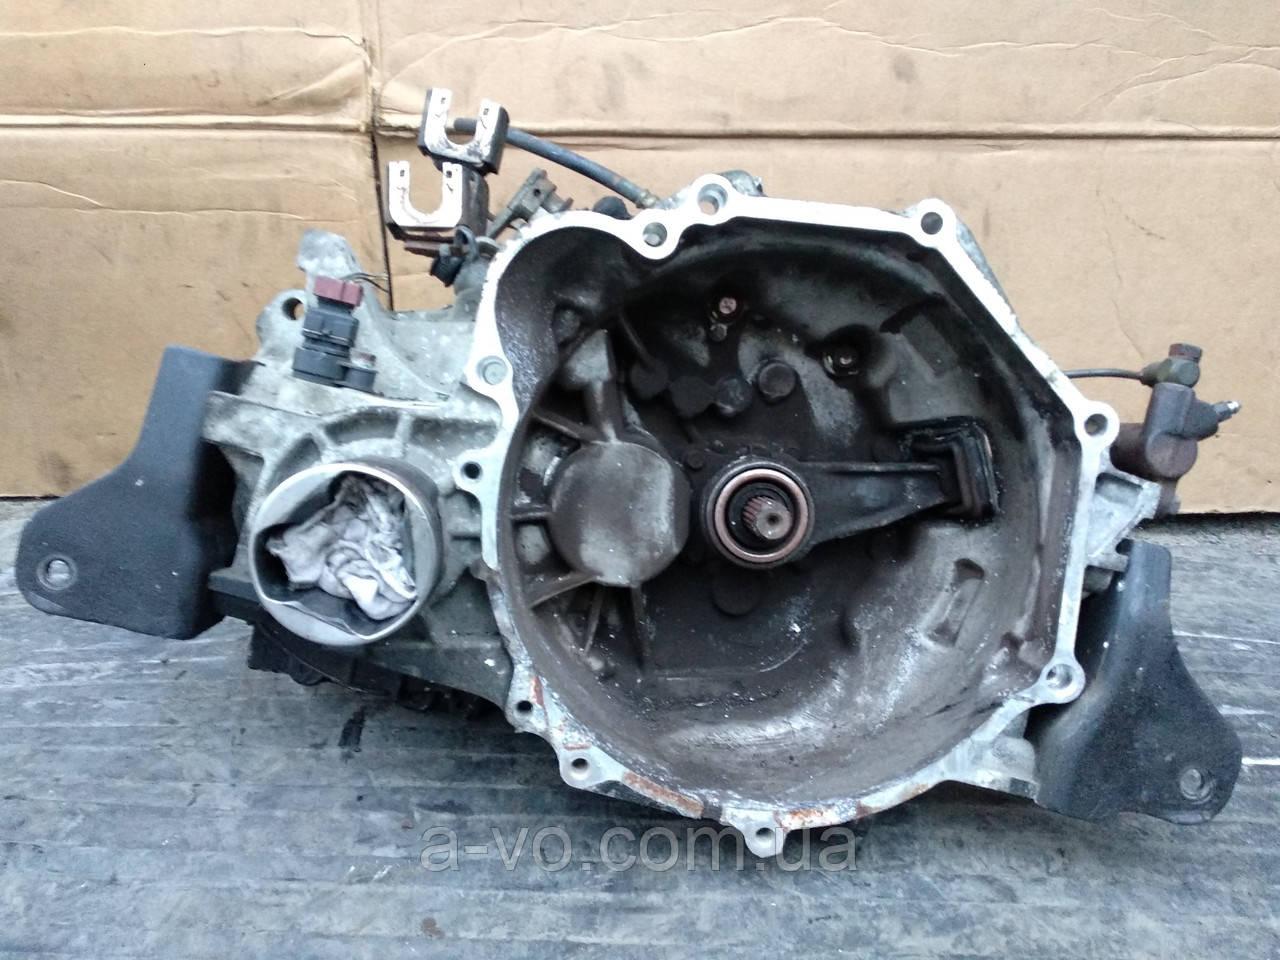 КПП Коробка передач для Mitsubishi Colt 1.3 F5M411R8A1